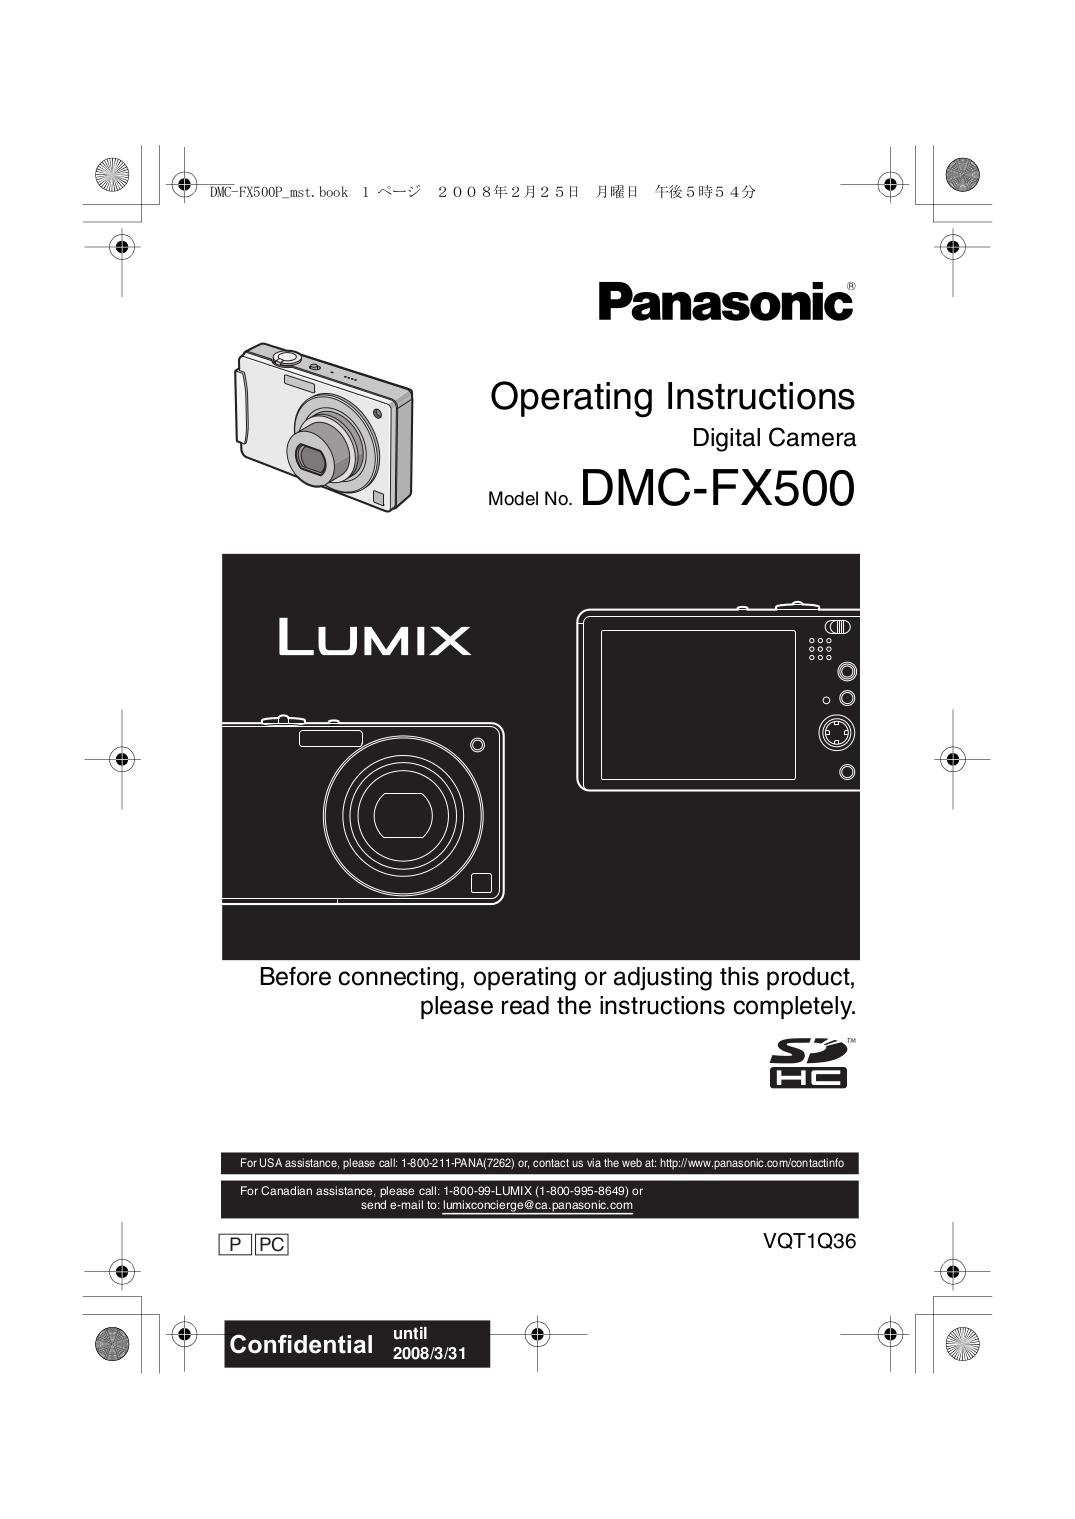 Panasonic dmc fx500 review | panasonic digital camera.